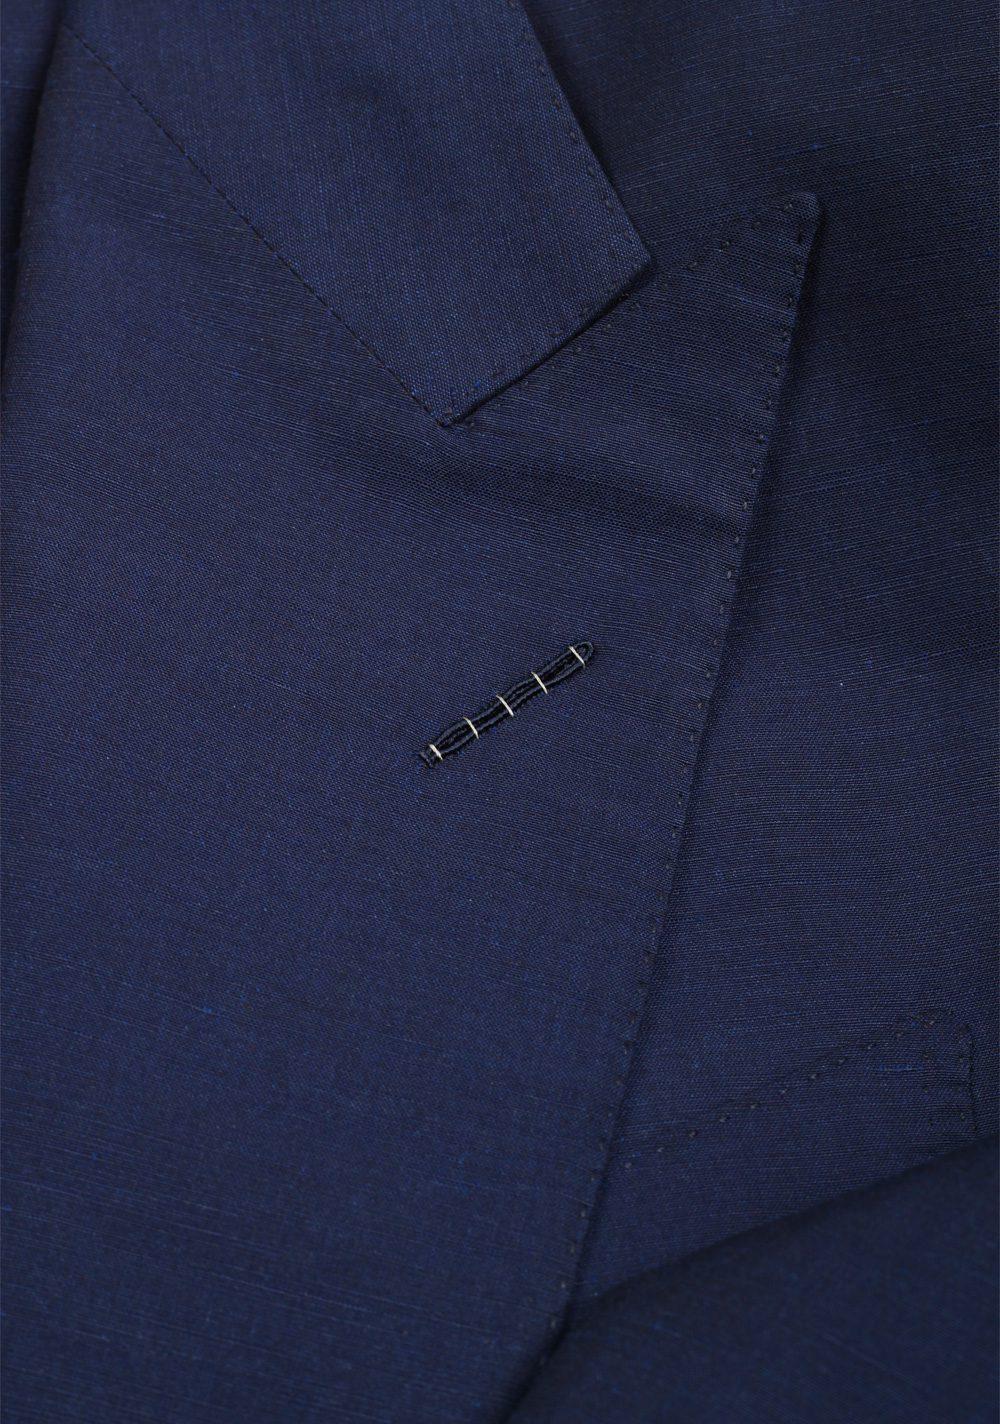 TOM FORD Windsor Solid Blue 3 Piece Suit | Costume Limité